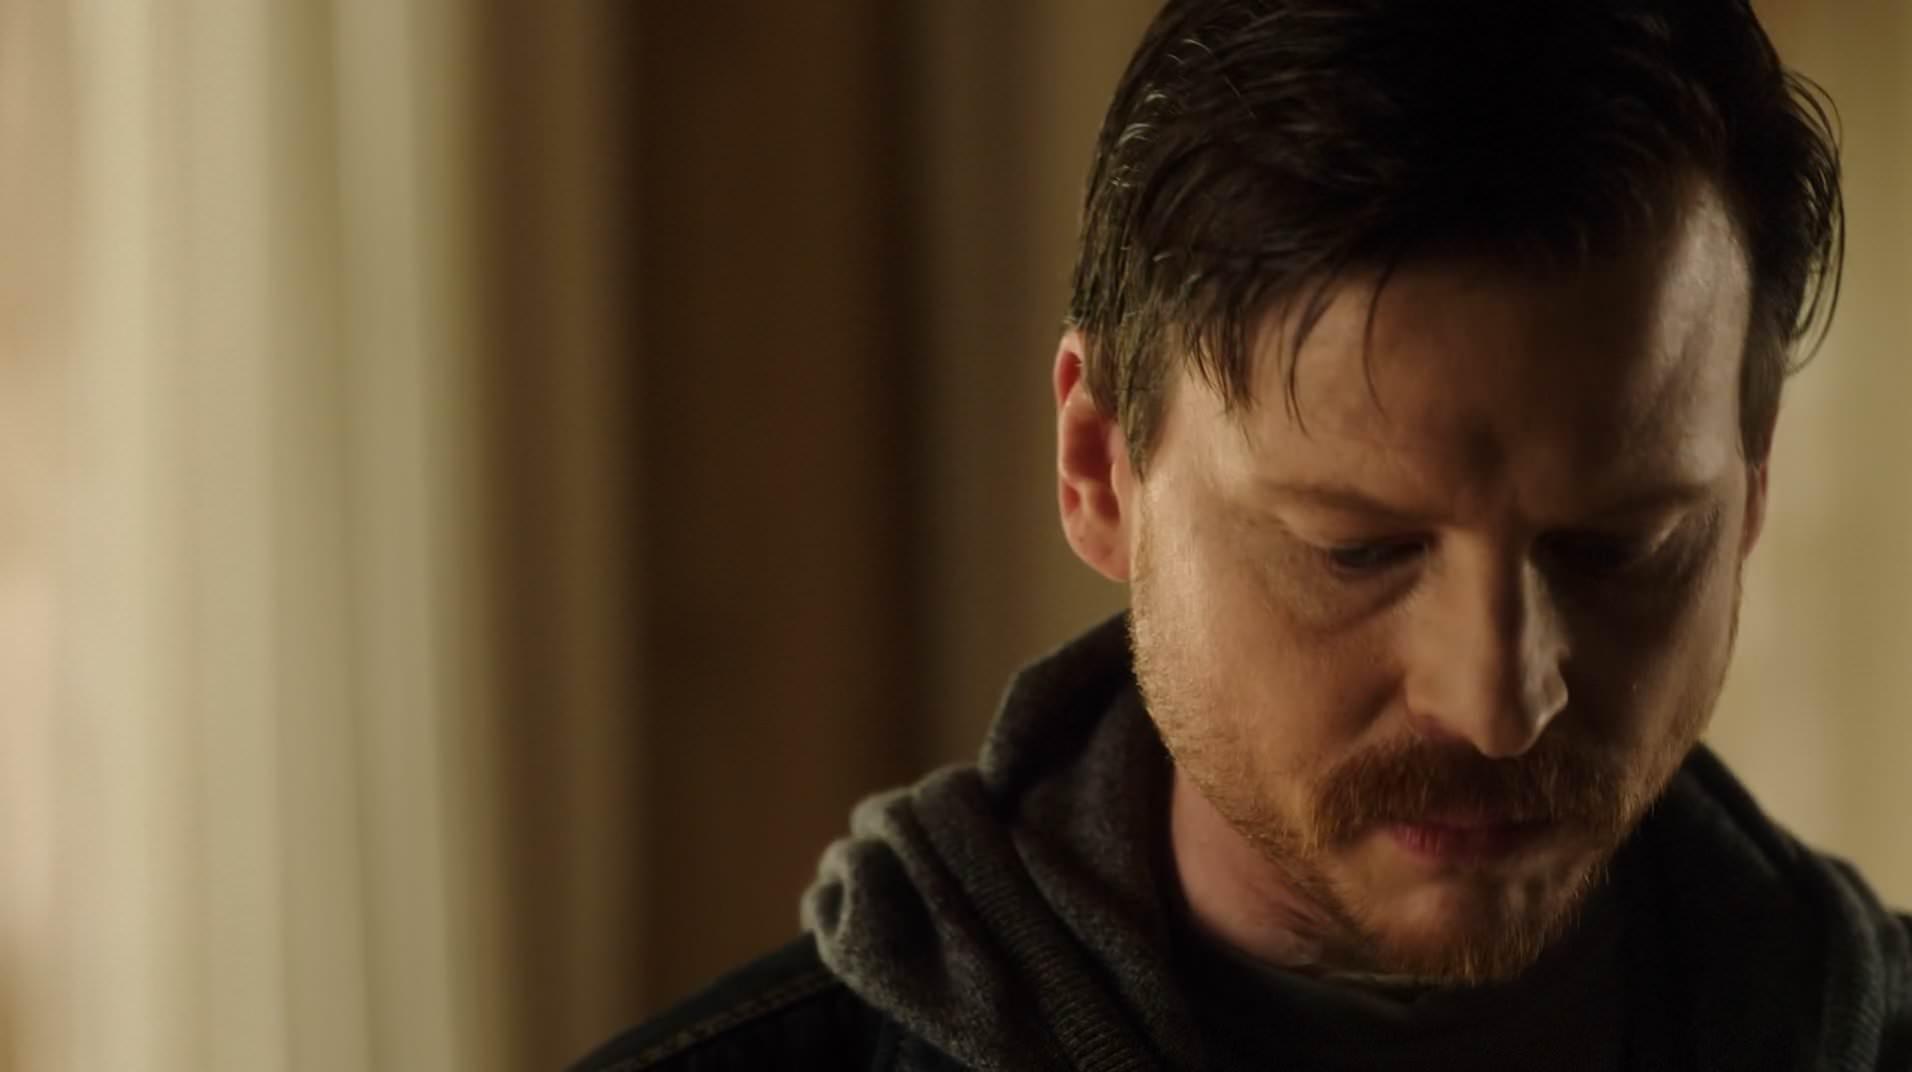 Lucifer 1x08 Et tu, Doctor Screencaps - Lucifer [TV